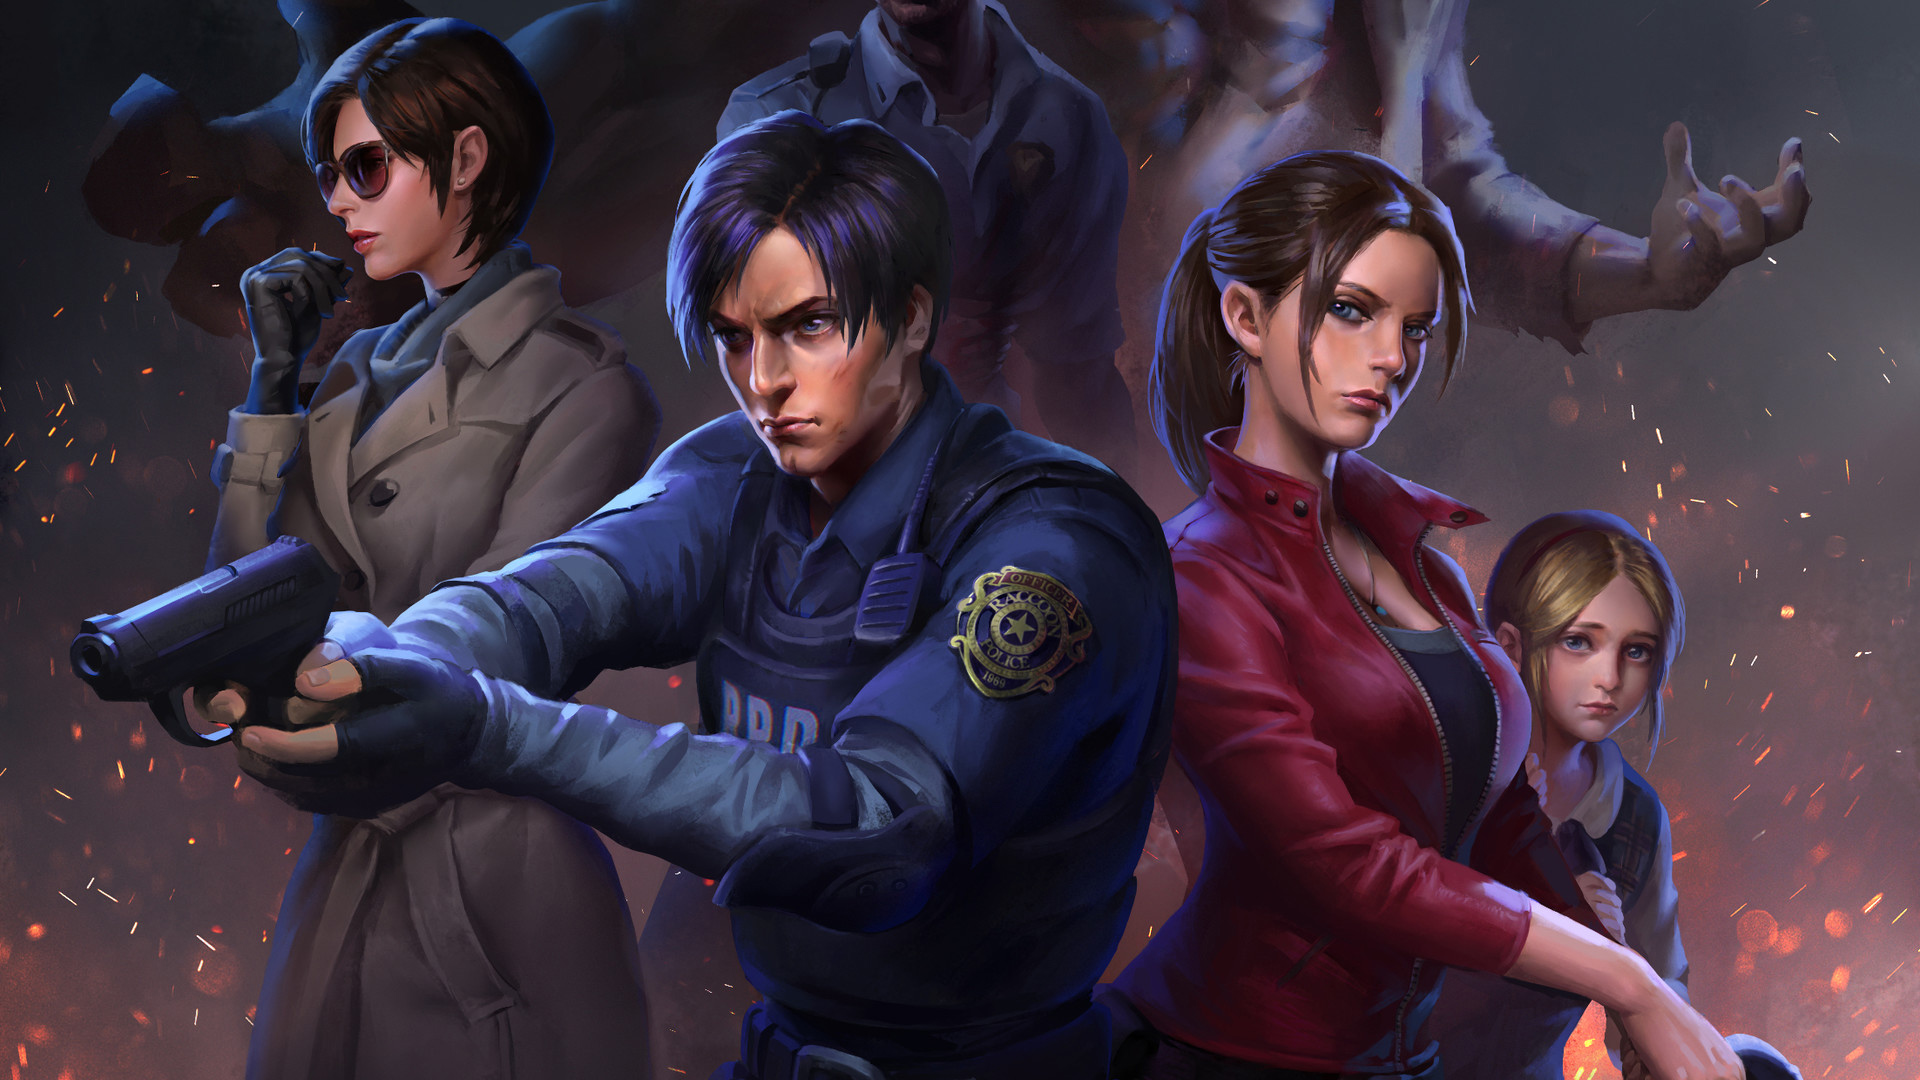 Resident Evil 2 Art Hd Games 4k Wallpapers Images Backgrounds